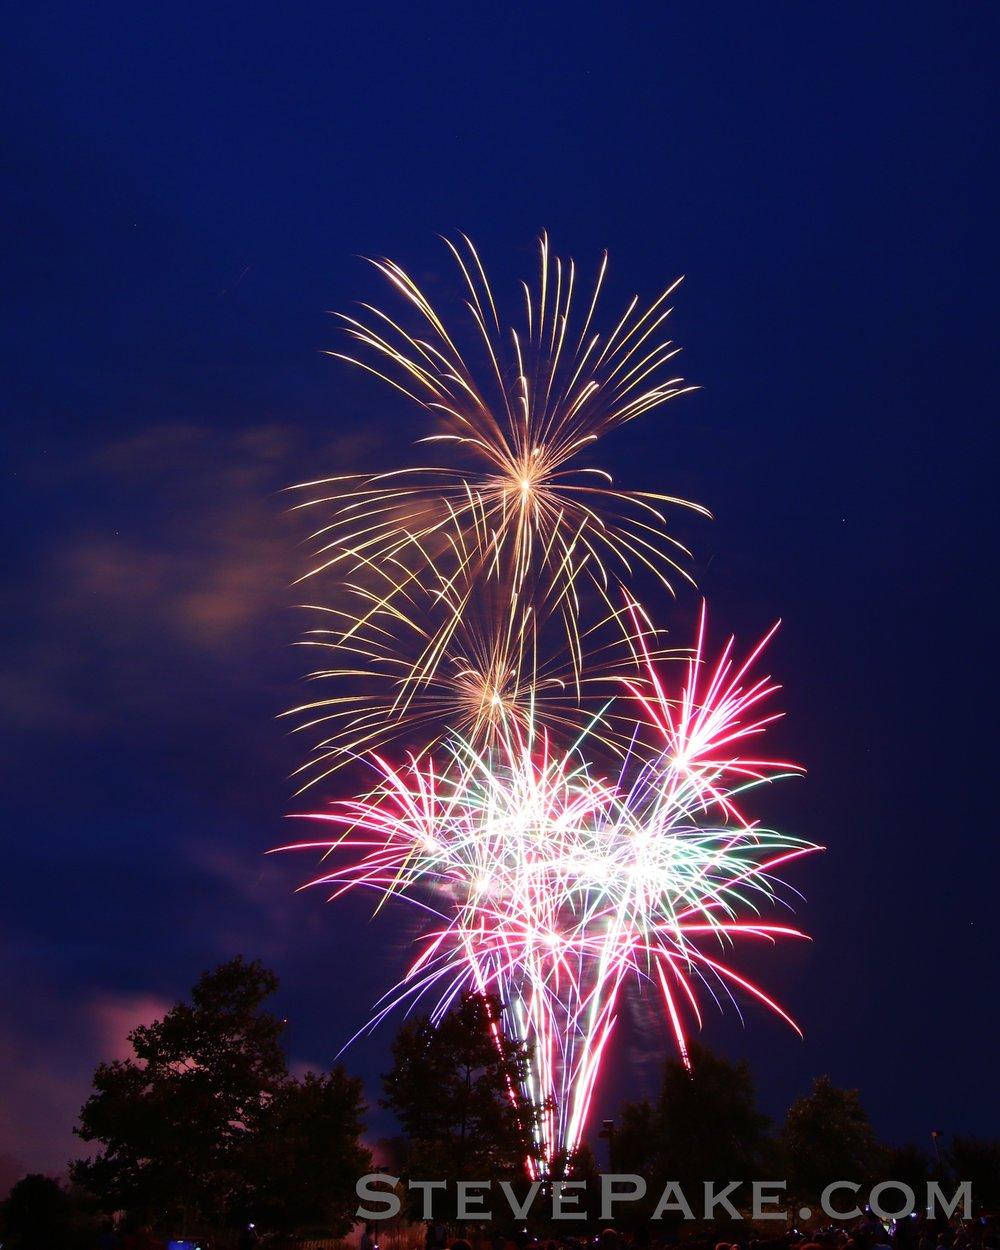 Fireworks2018_13_GE3A8512ap-HD-WM.jpg